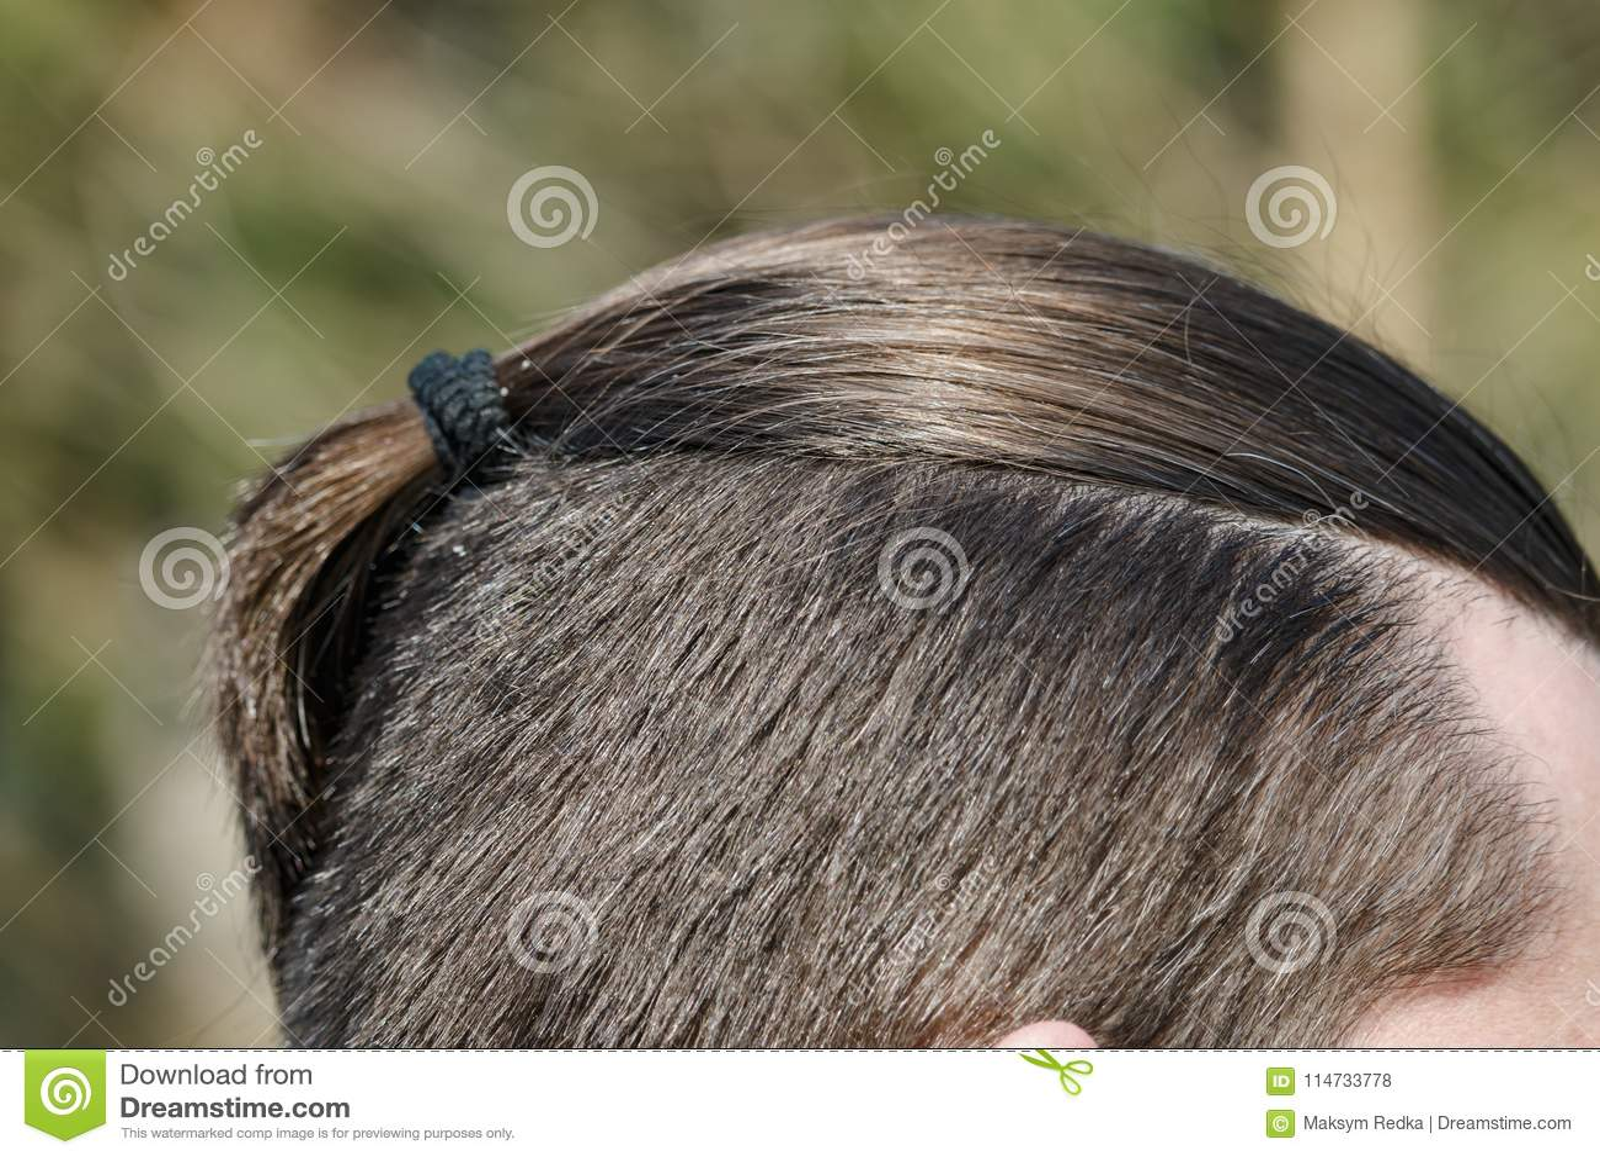 Mannelijke kapselvlecht, close-up op een aardachtergrond